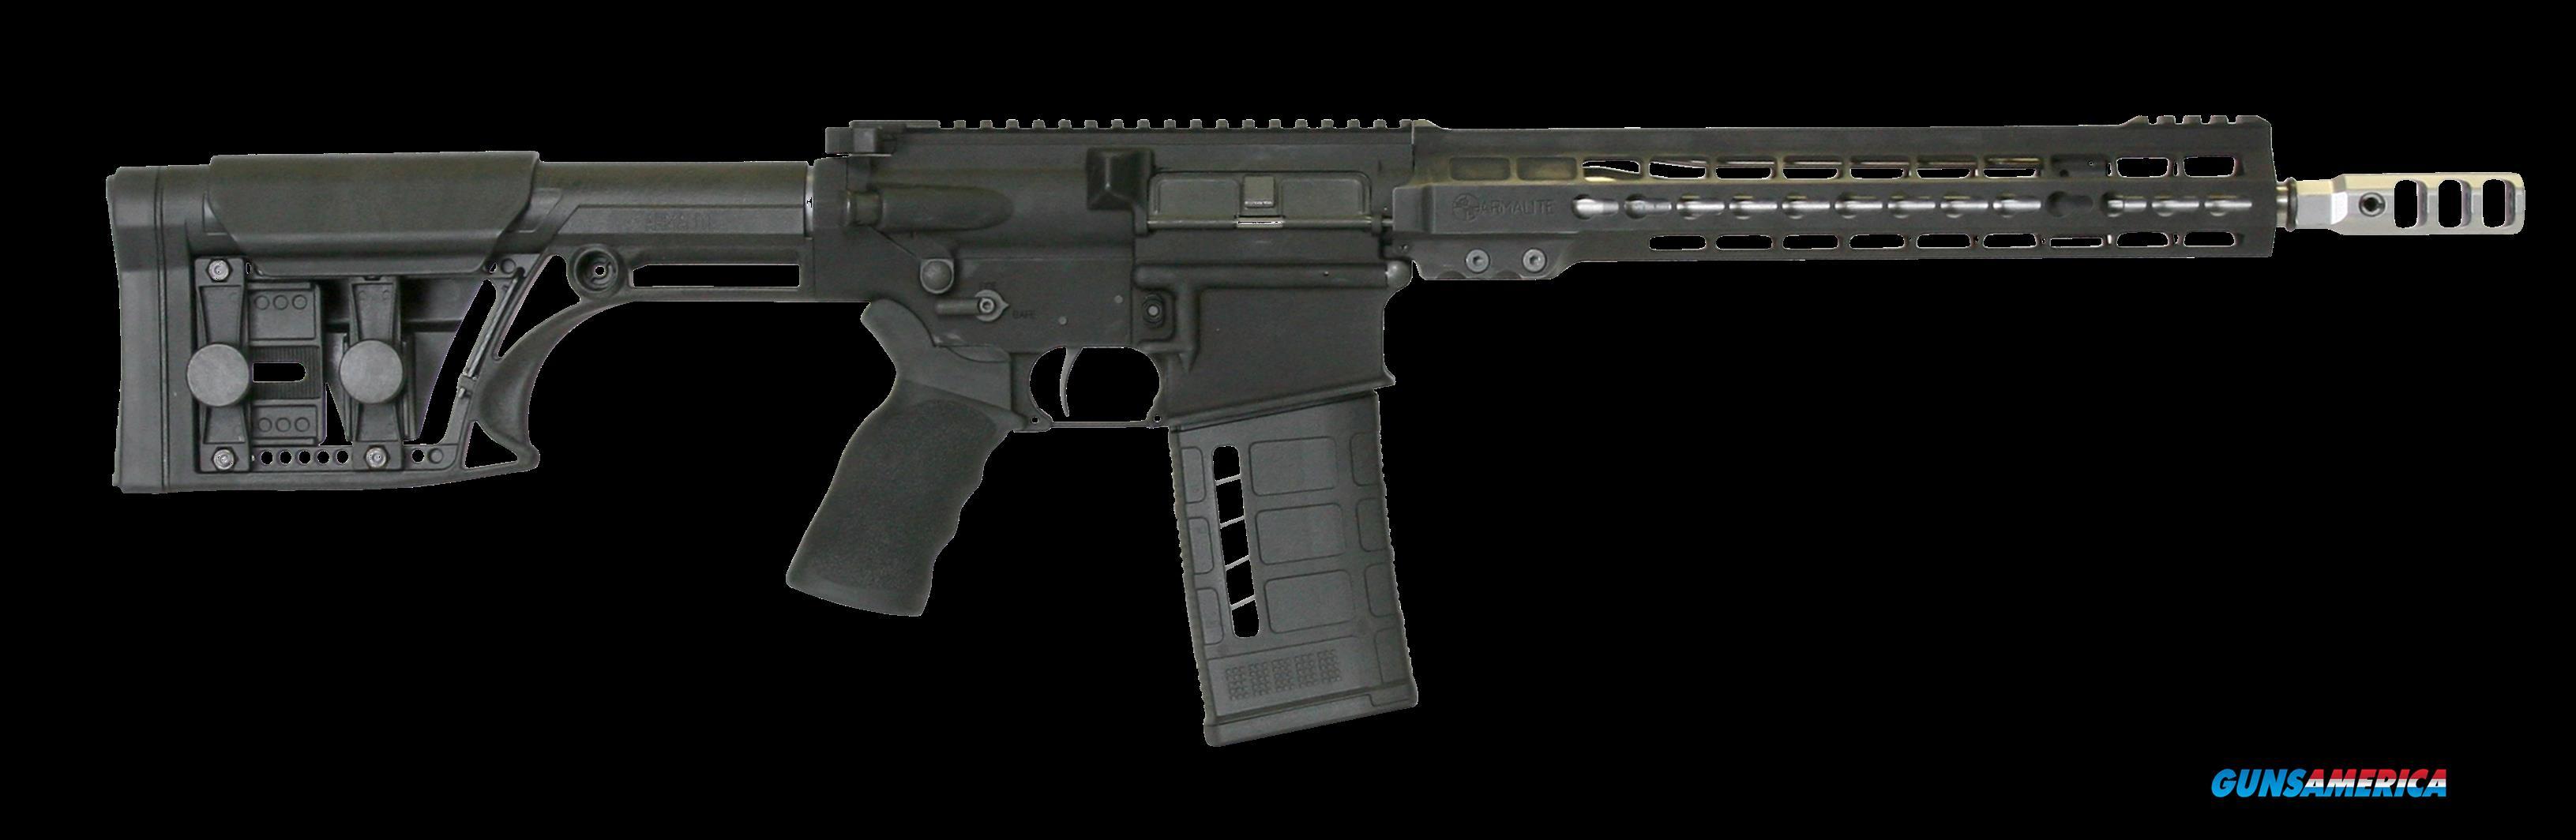 Armalite Ar-10, Arml Ar103gn13    3gun Rfl 308         13.5  Guns > Pistols > 1911 Pistol Copies (non-Colt)